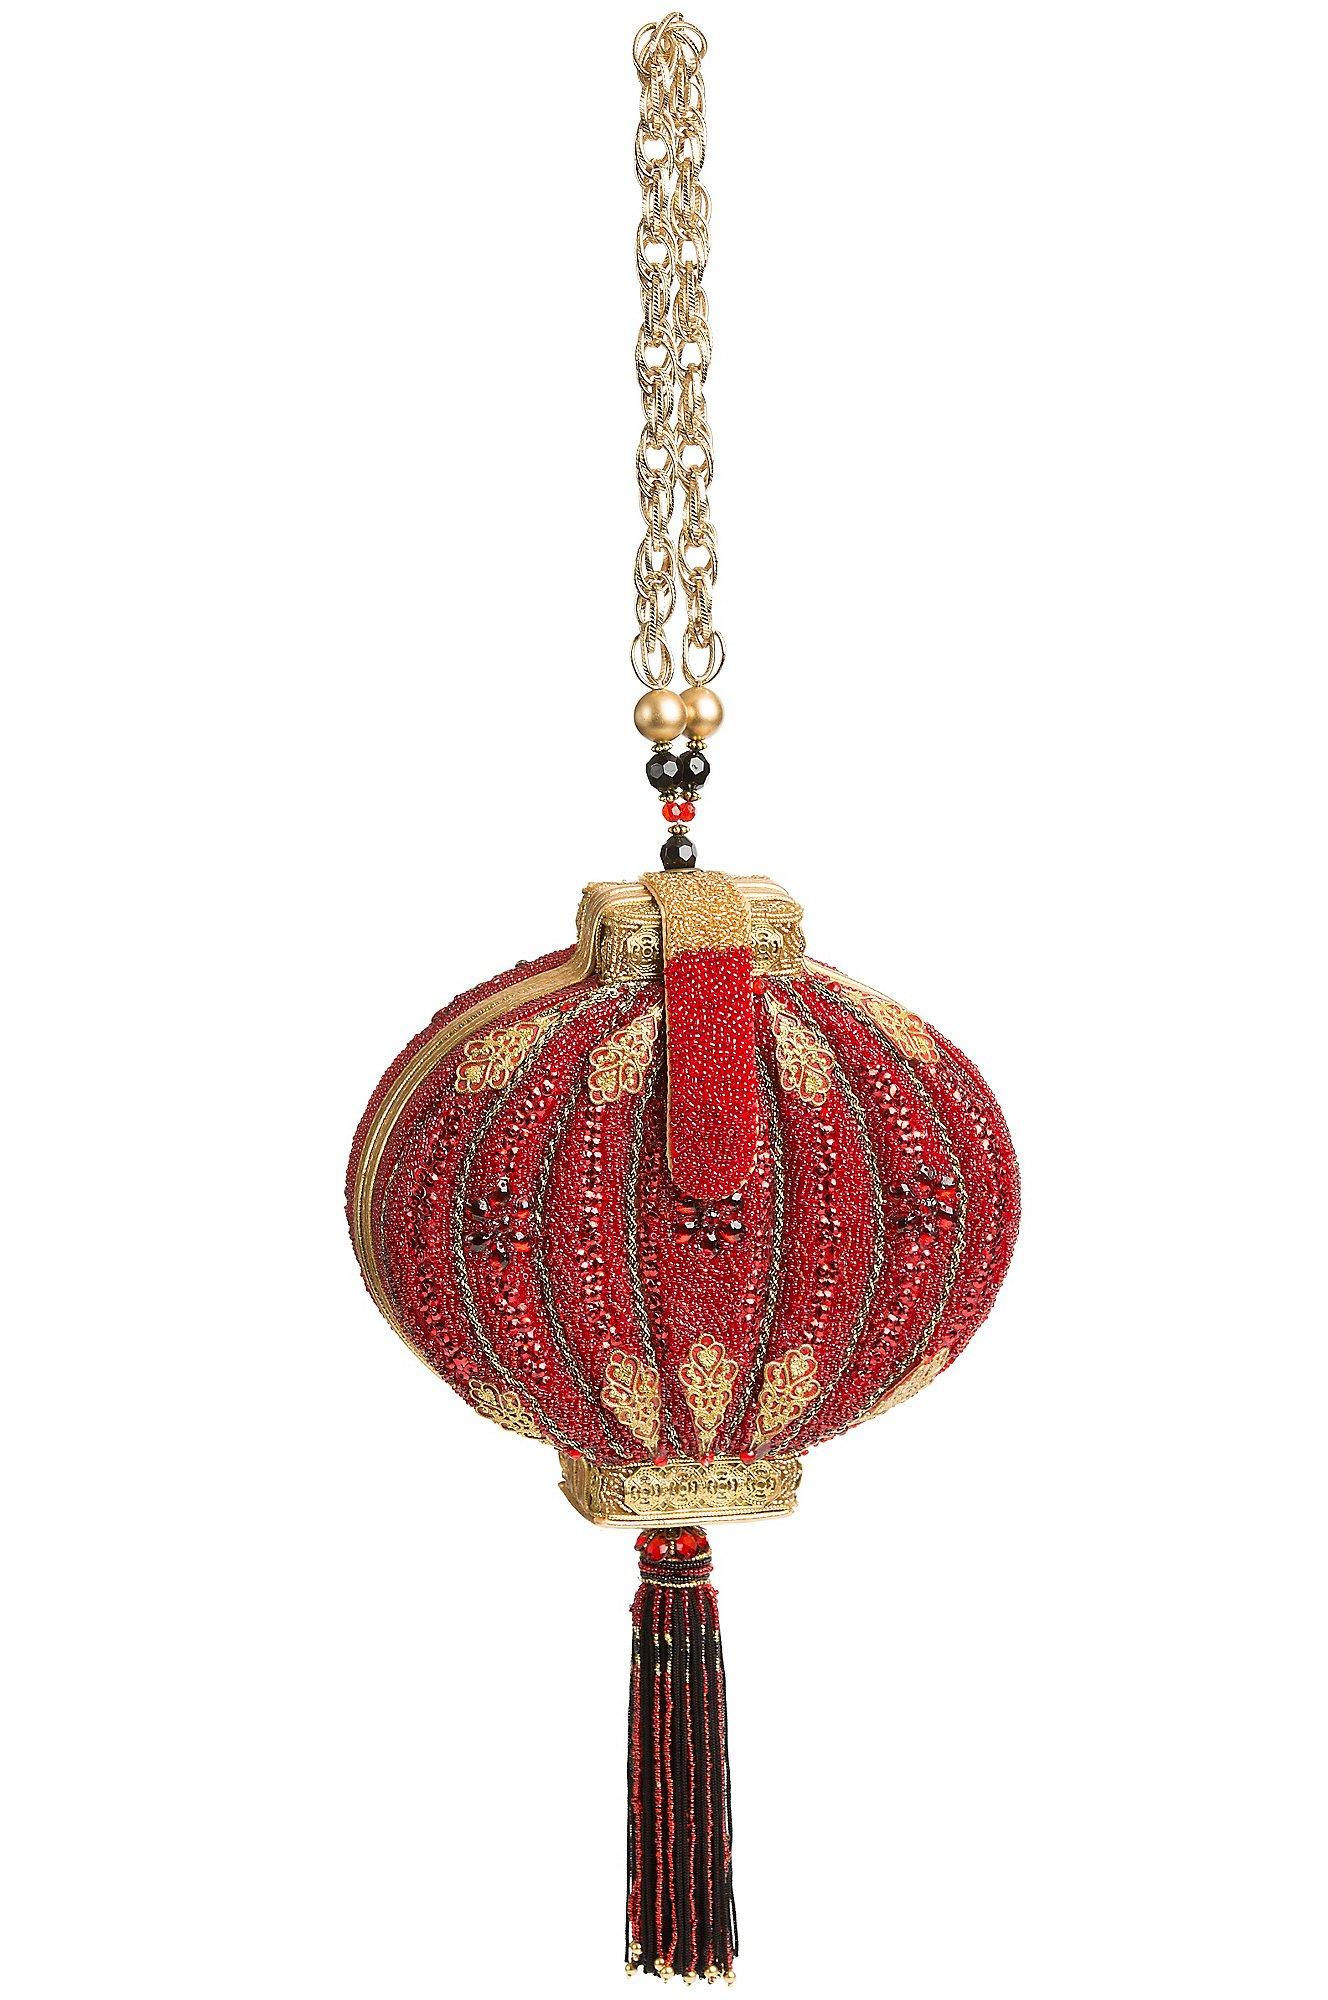 Mary Frances Enlightened Handbag Lantern Red Gold Bag New